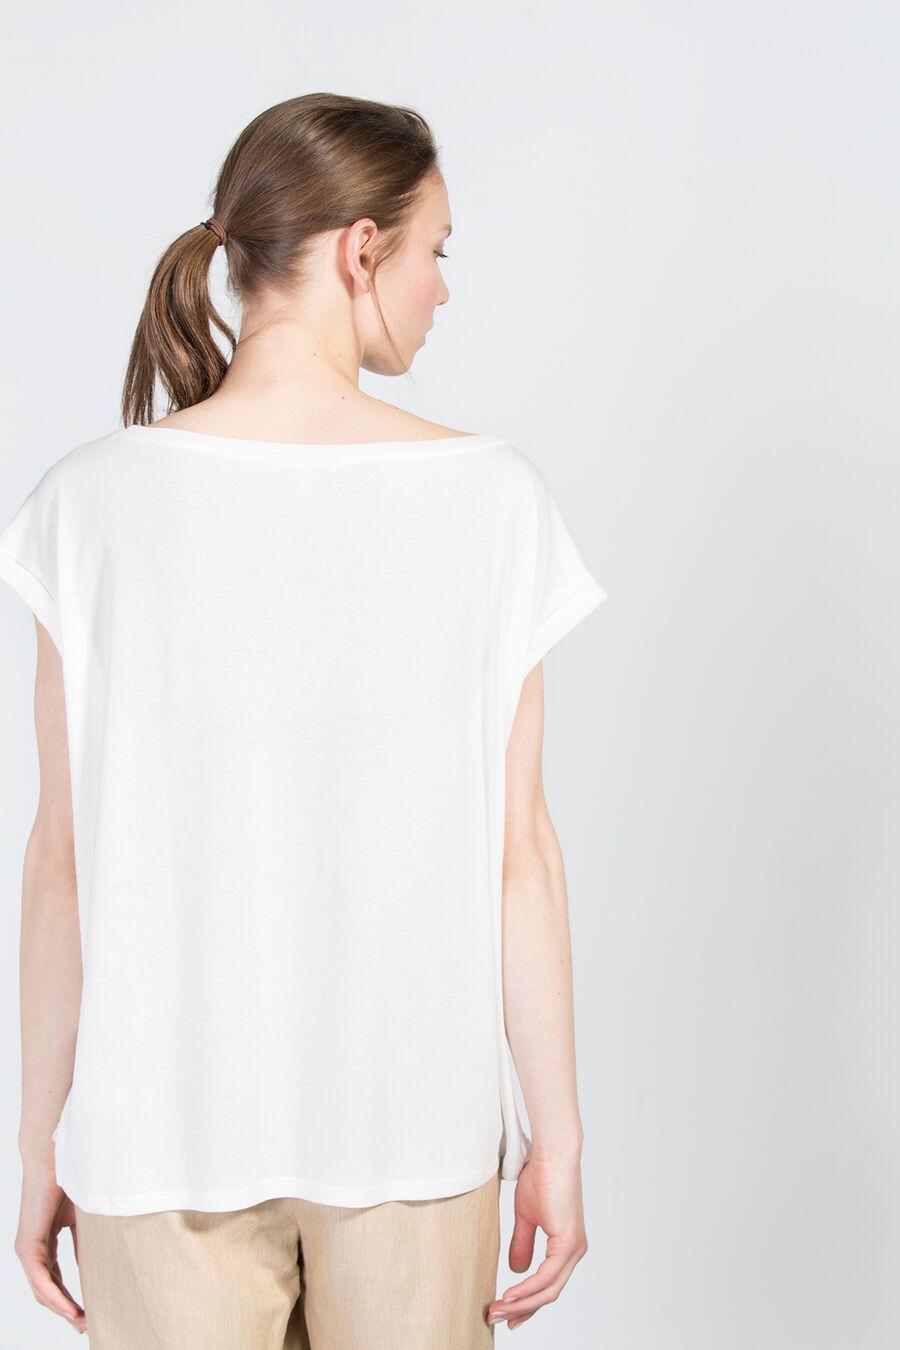 Camiseta laminado